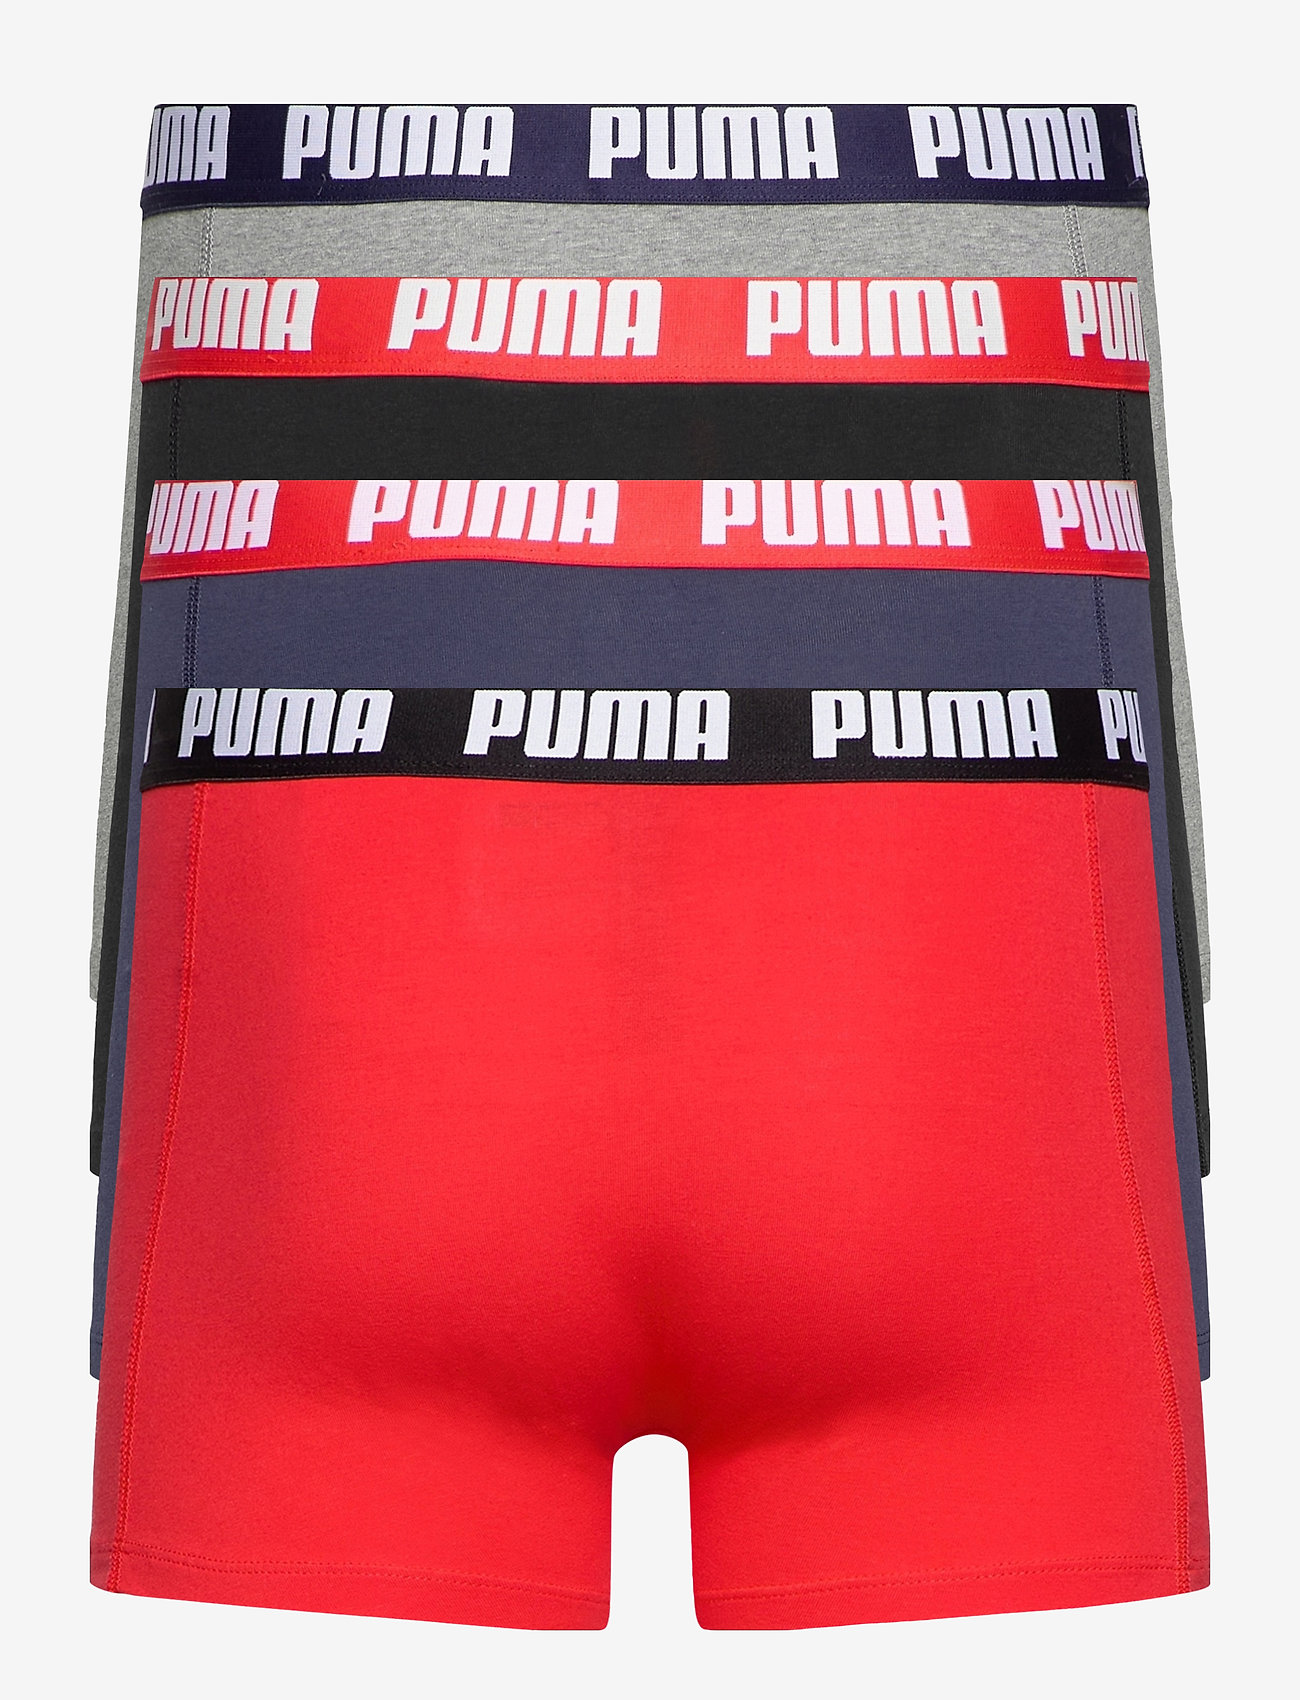 PUMA - PUMA BASIC BOXER 4P ECOM - boxerkalsonger - red combo - 1